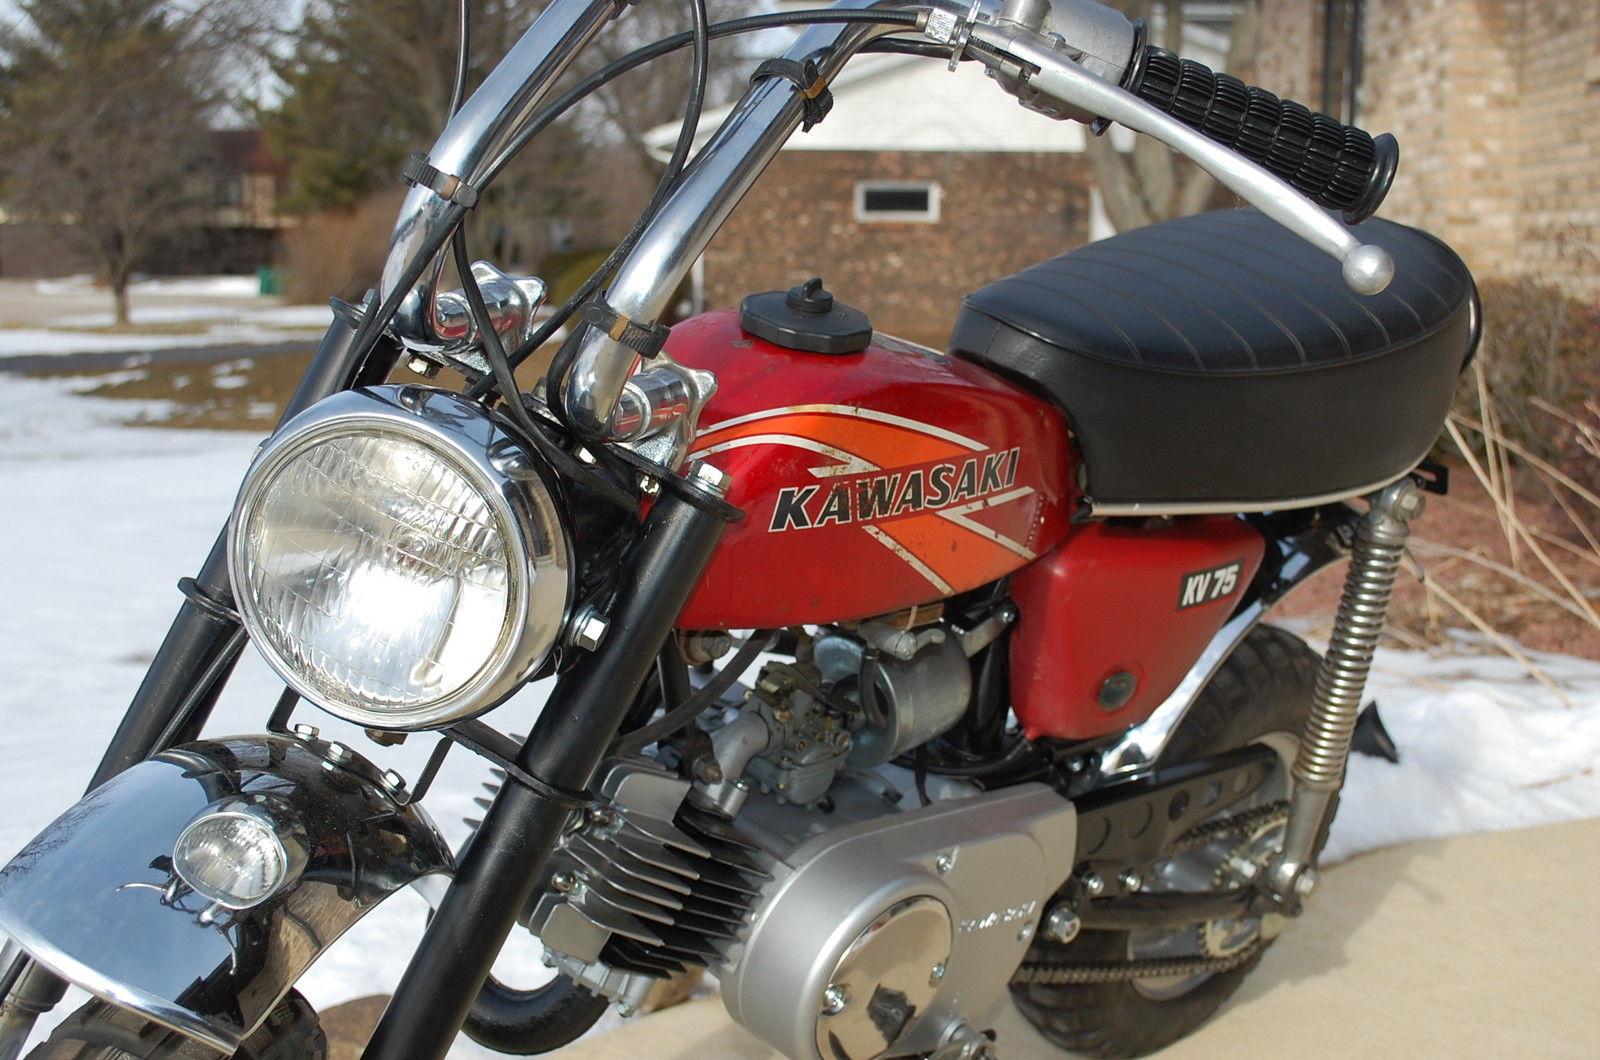 Kawasaki Kv 75 1976 A 5 Mini Trail 75cc 2stroke Vintage Bike 1970 Honda Motorcycle Other